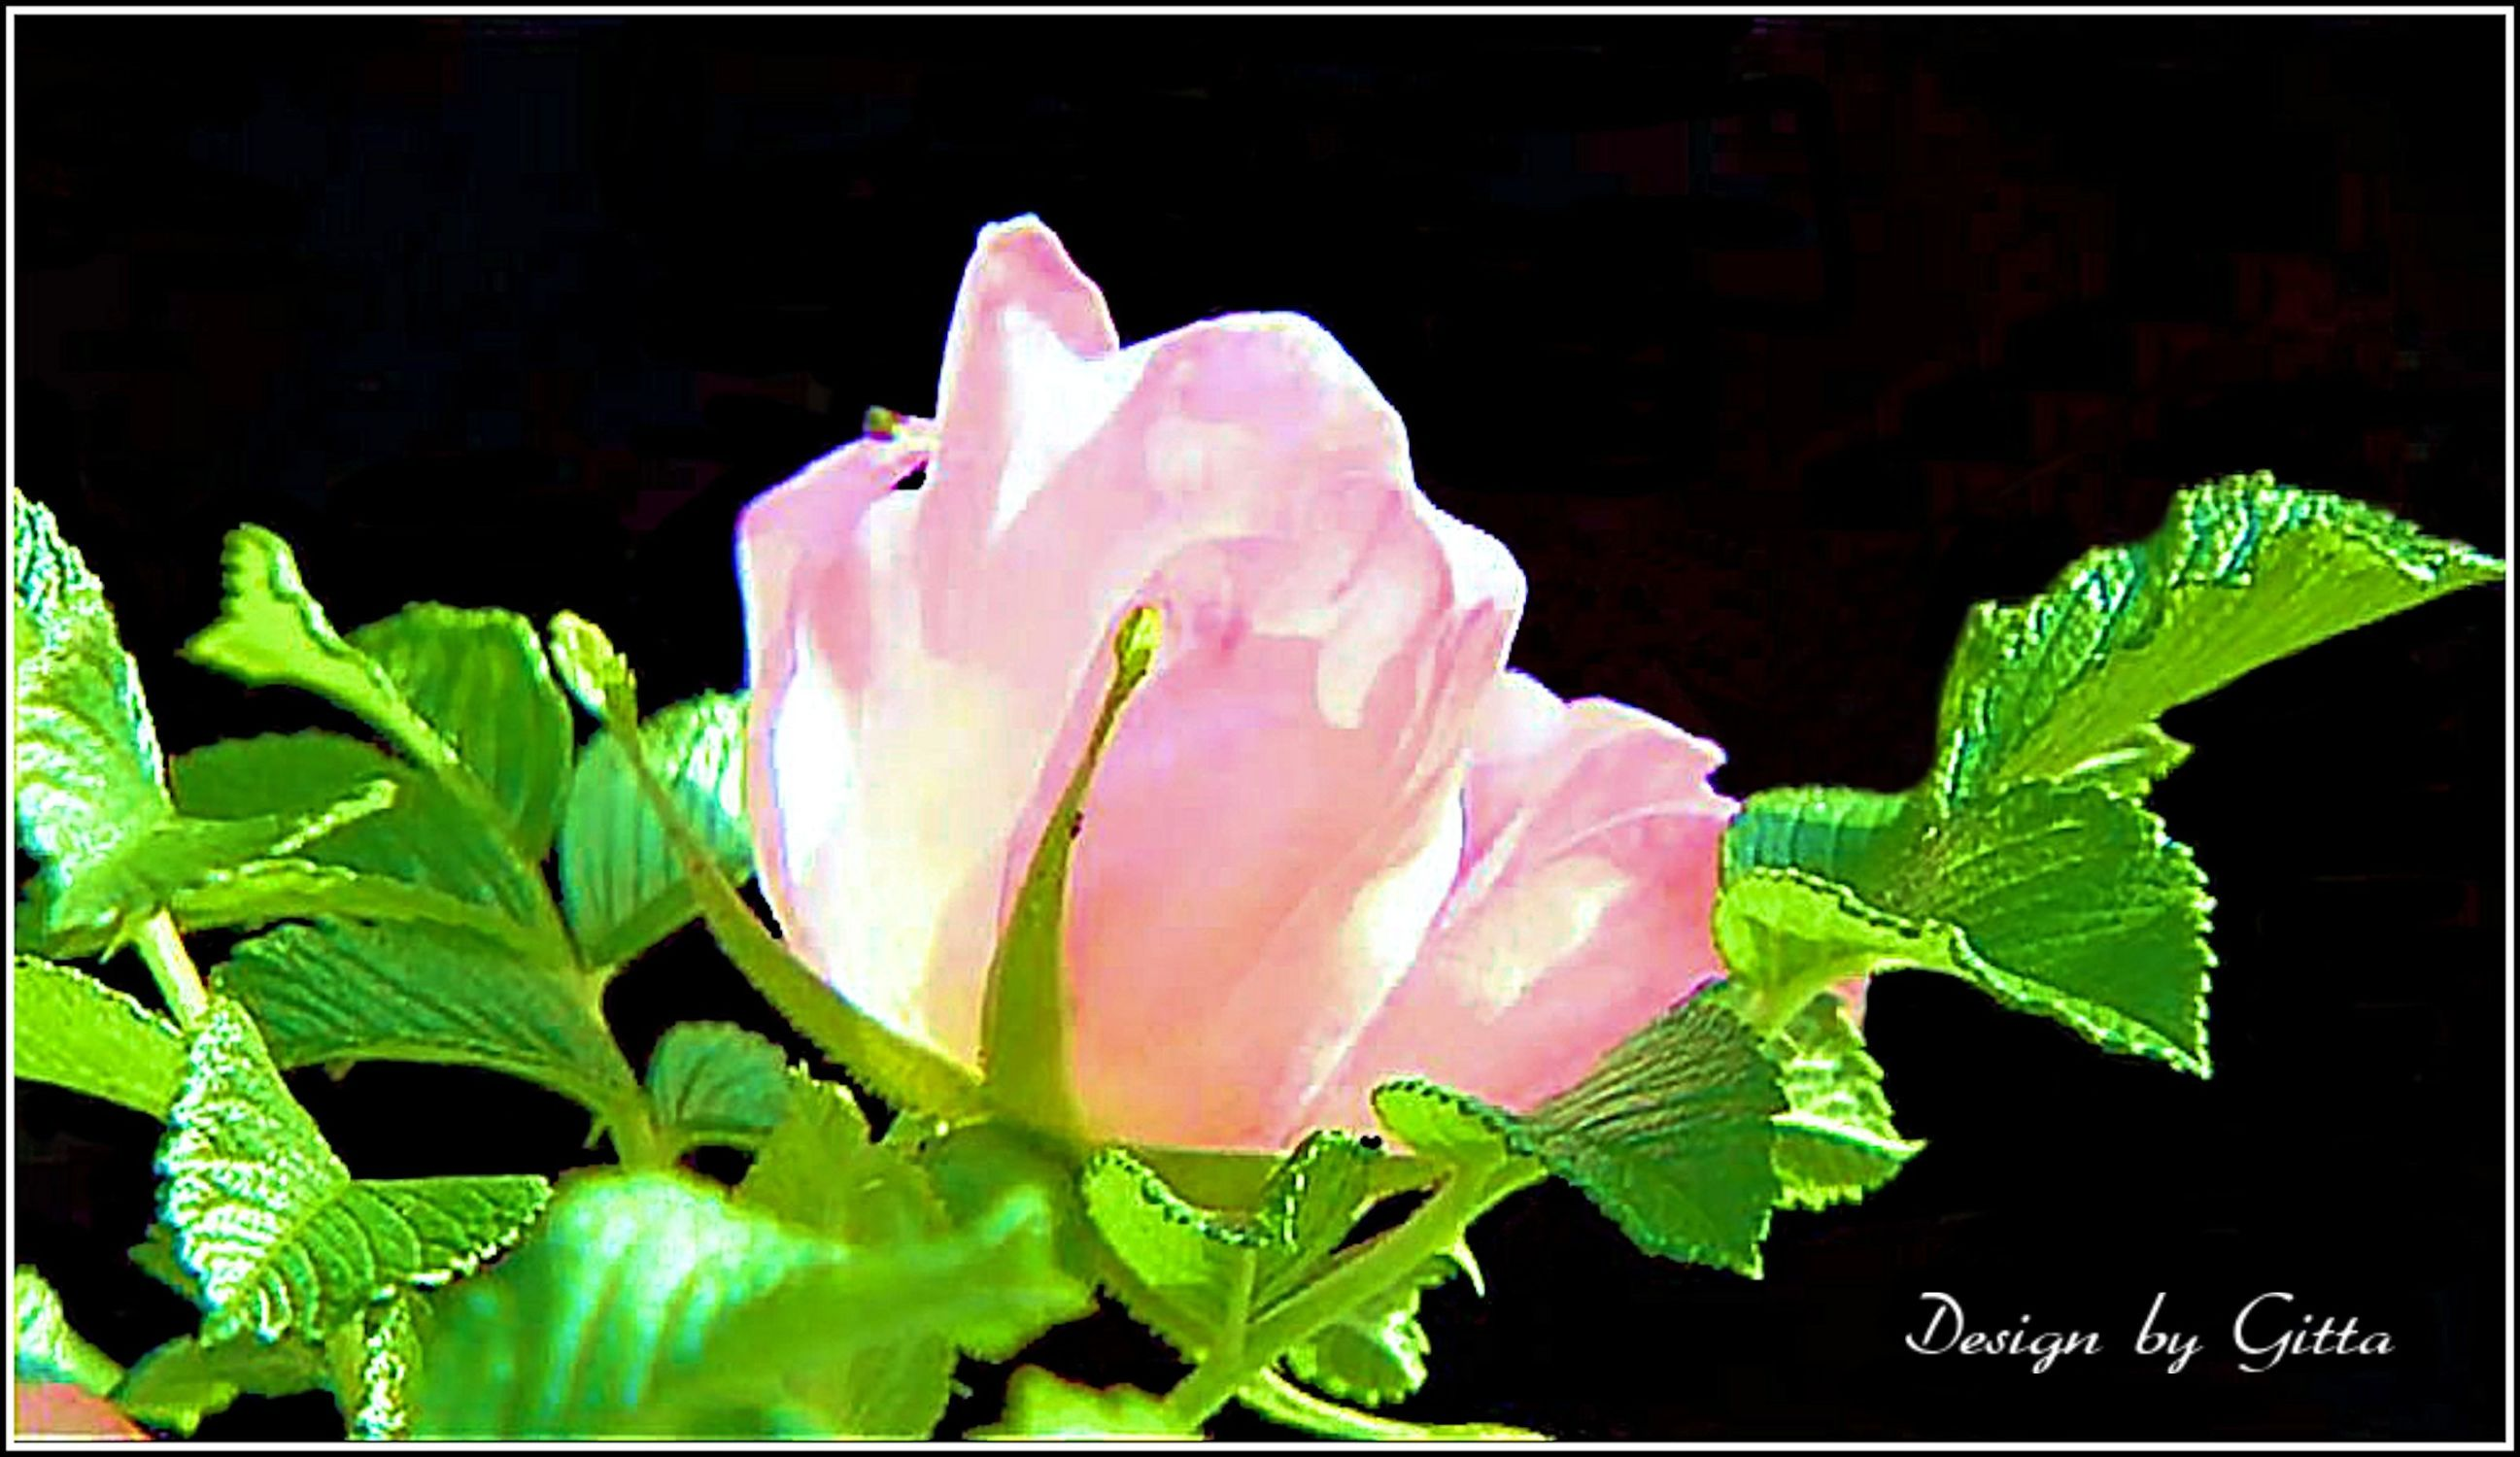 Bild mit Blumen, Rosenblüte, Blumen im Makro, Blumenmakro